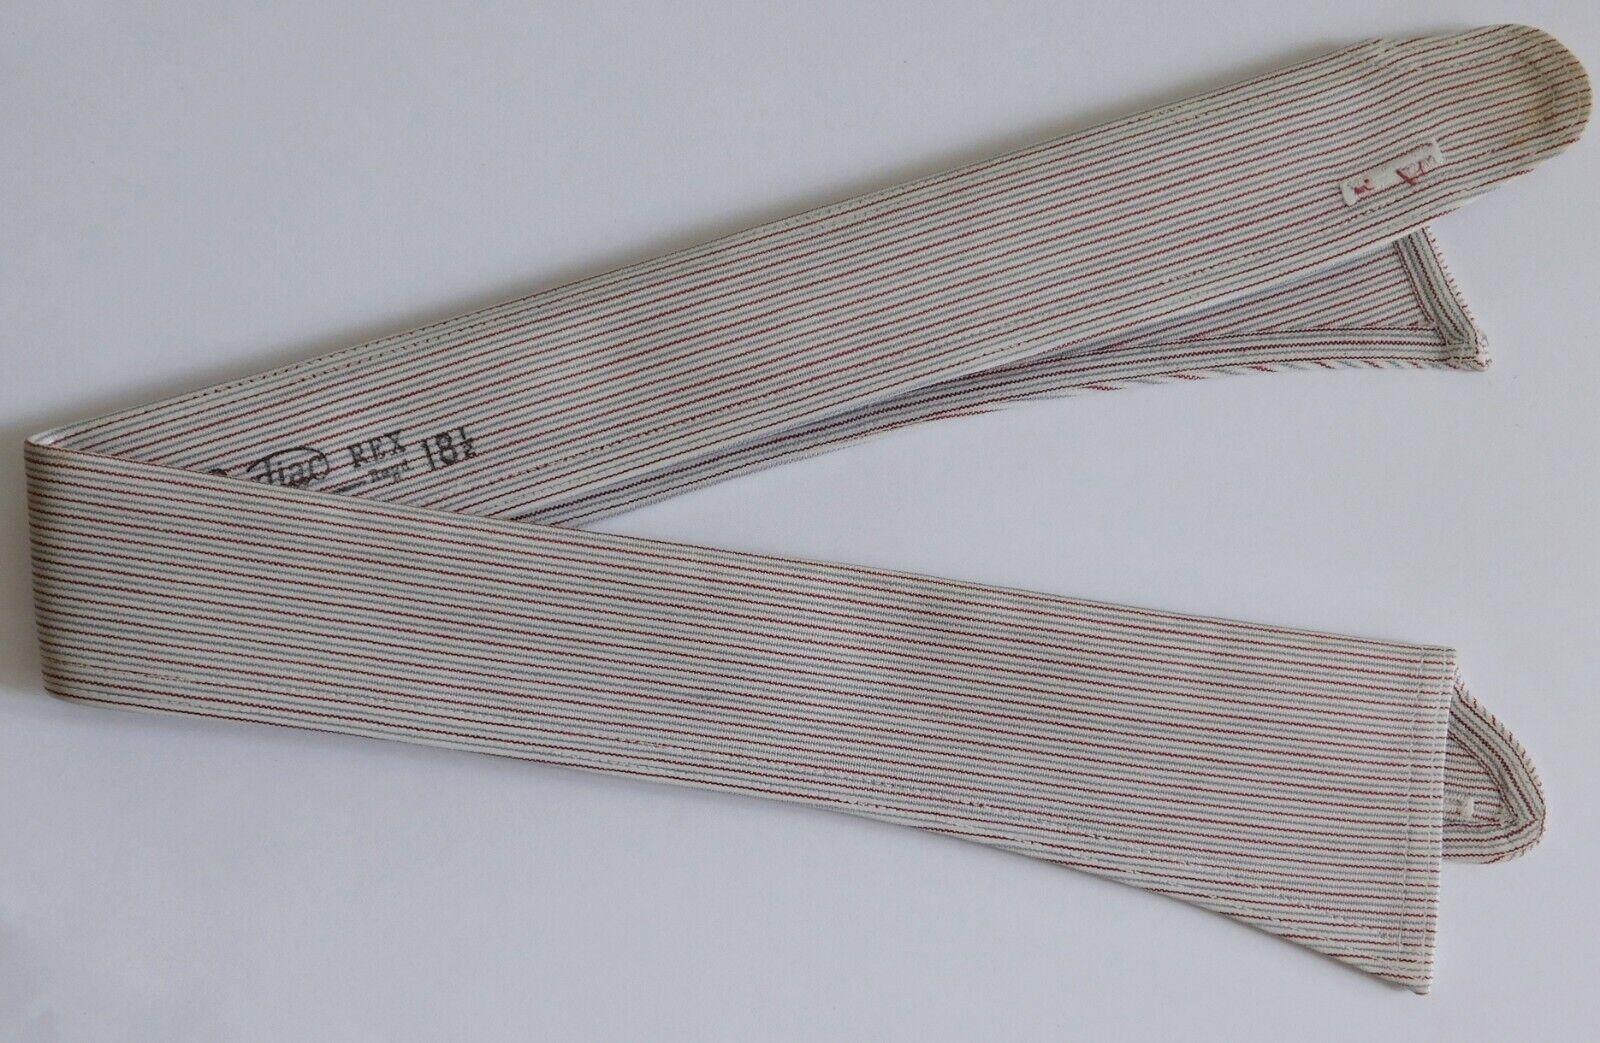 Radiac Rex striped shirt collar size 18.5 UNUSED vintage detachable SHOP SOILED